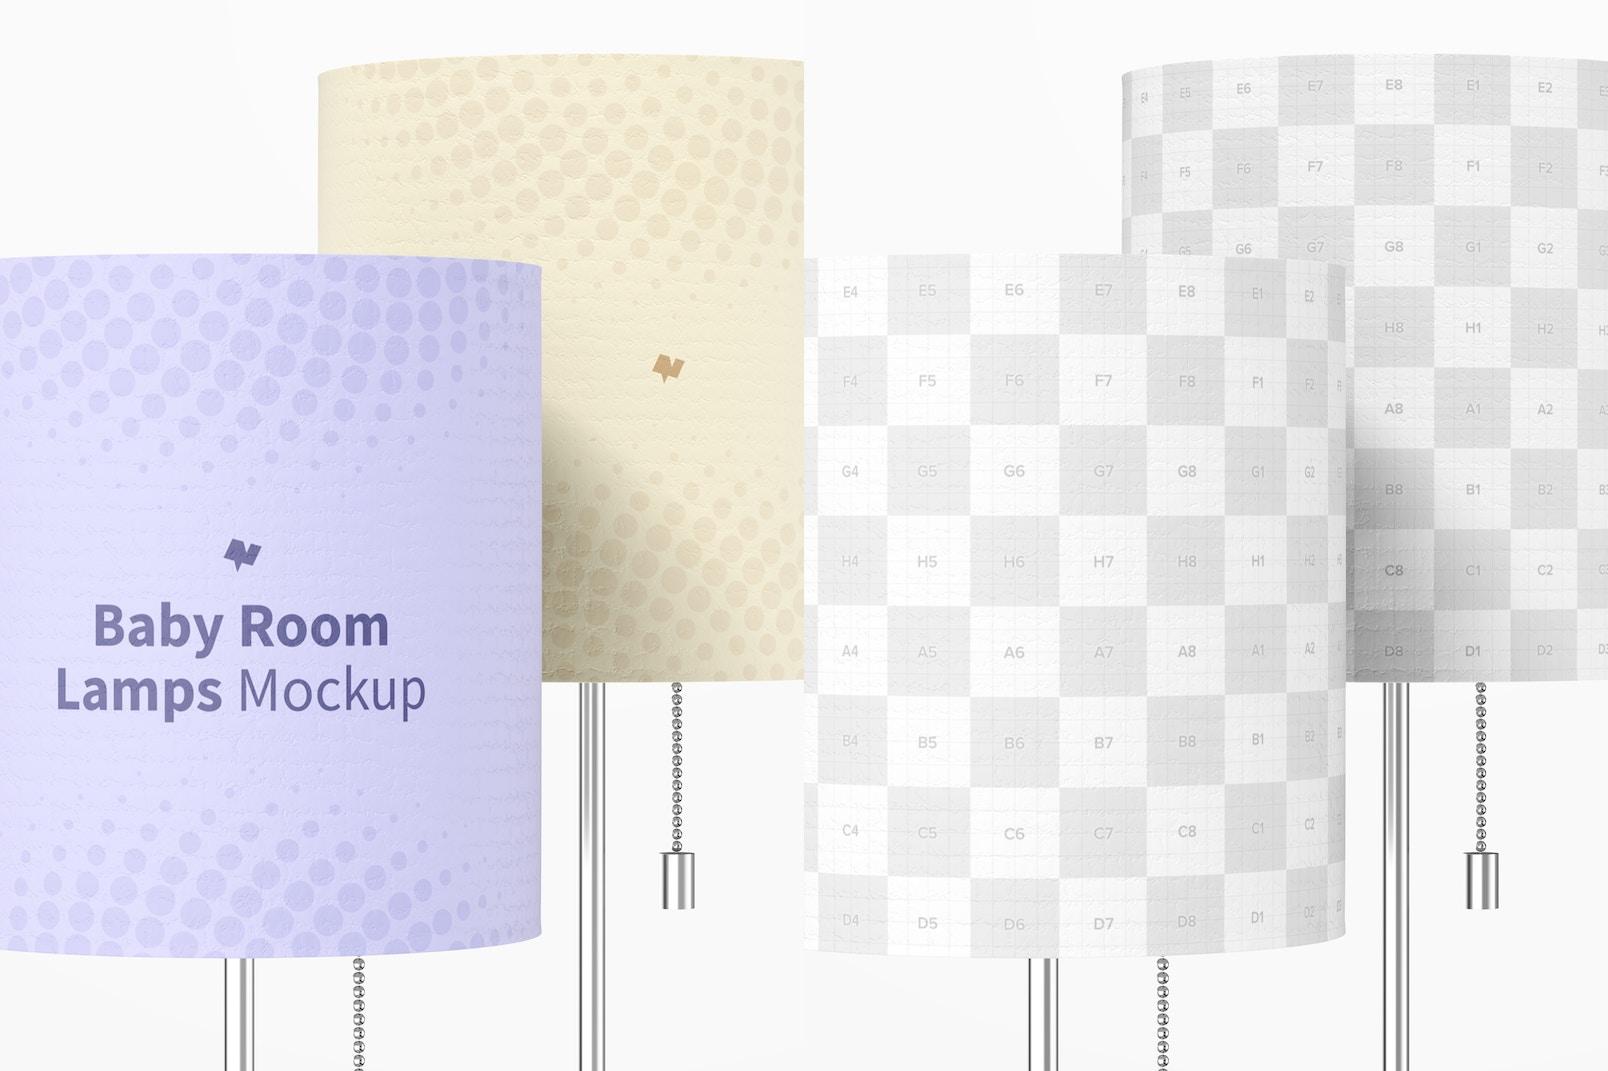 Baby Room Lamps Mockup, Close-up